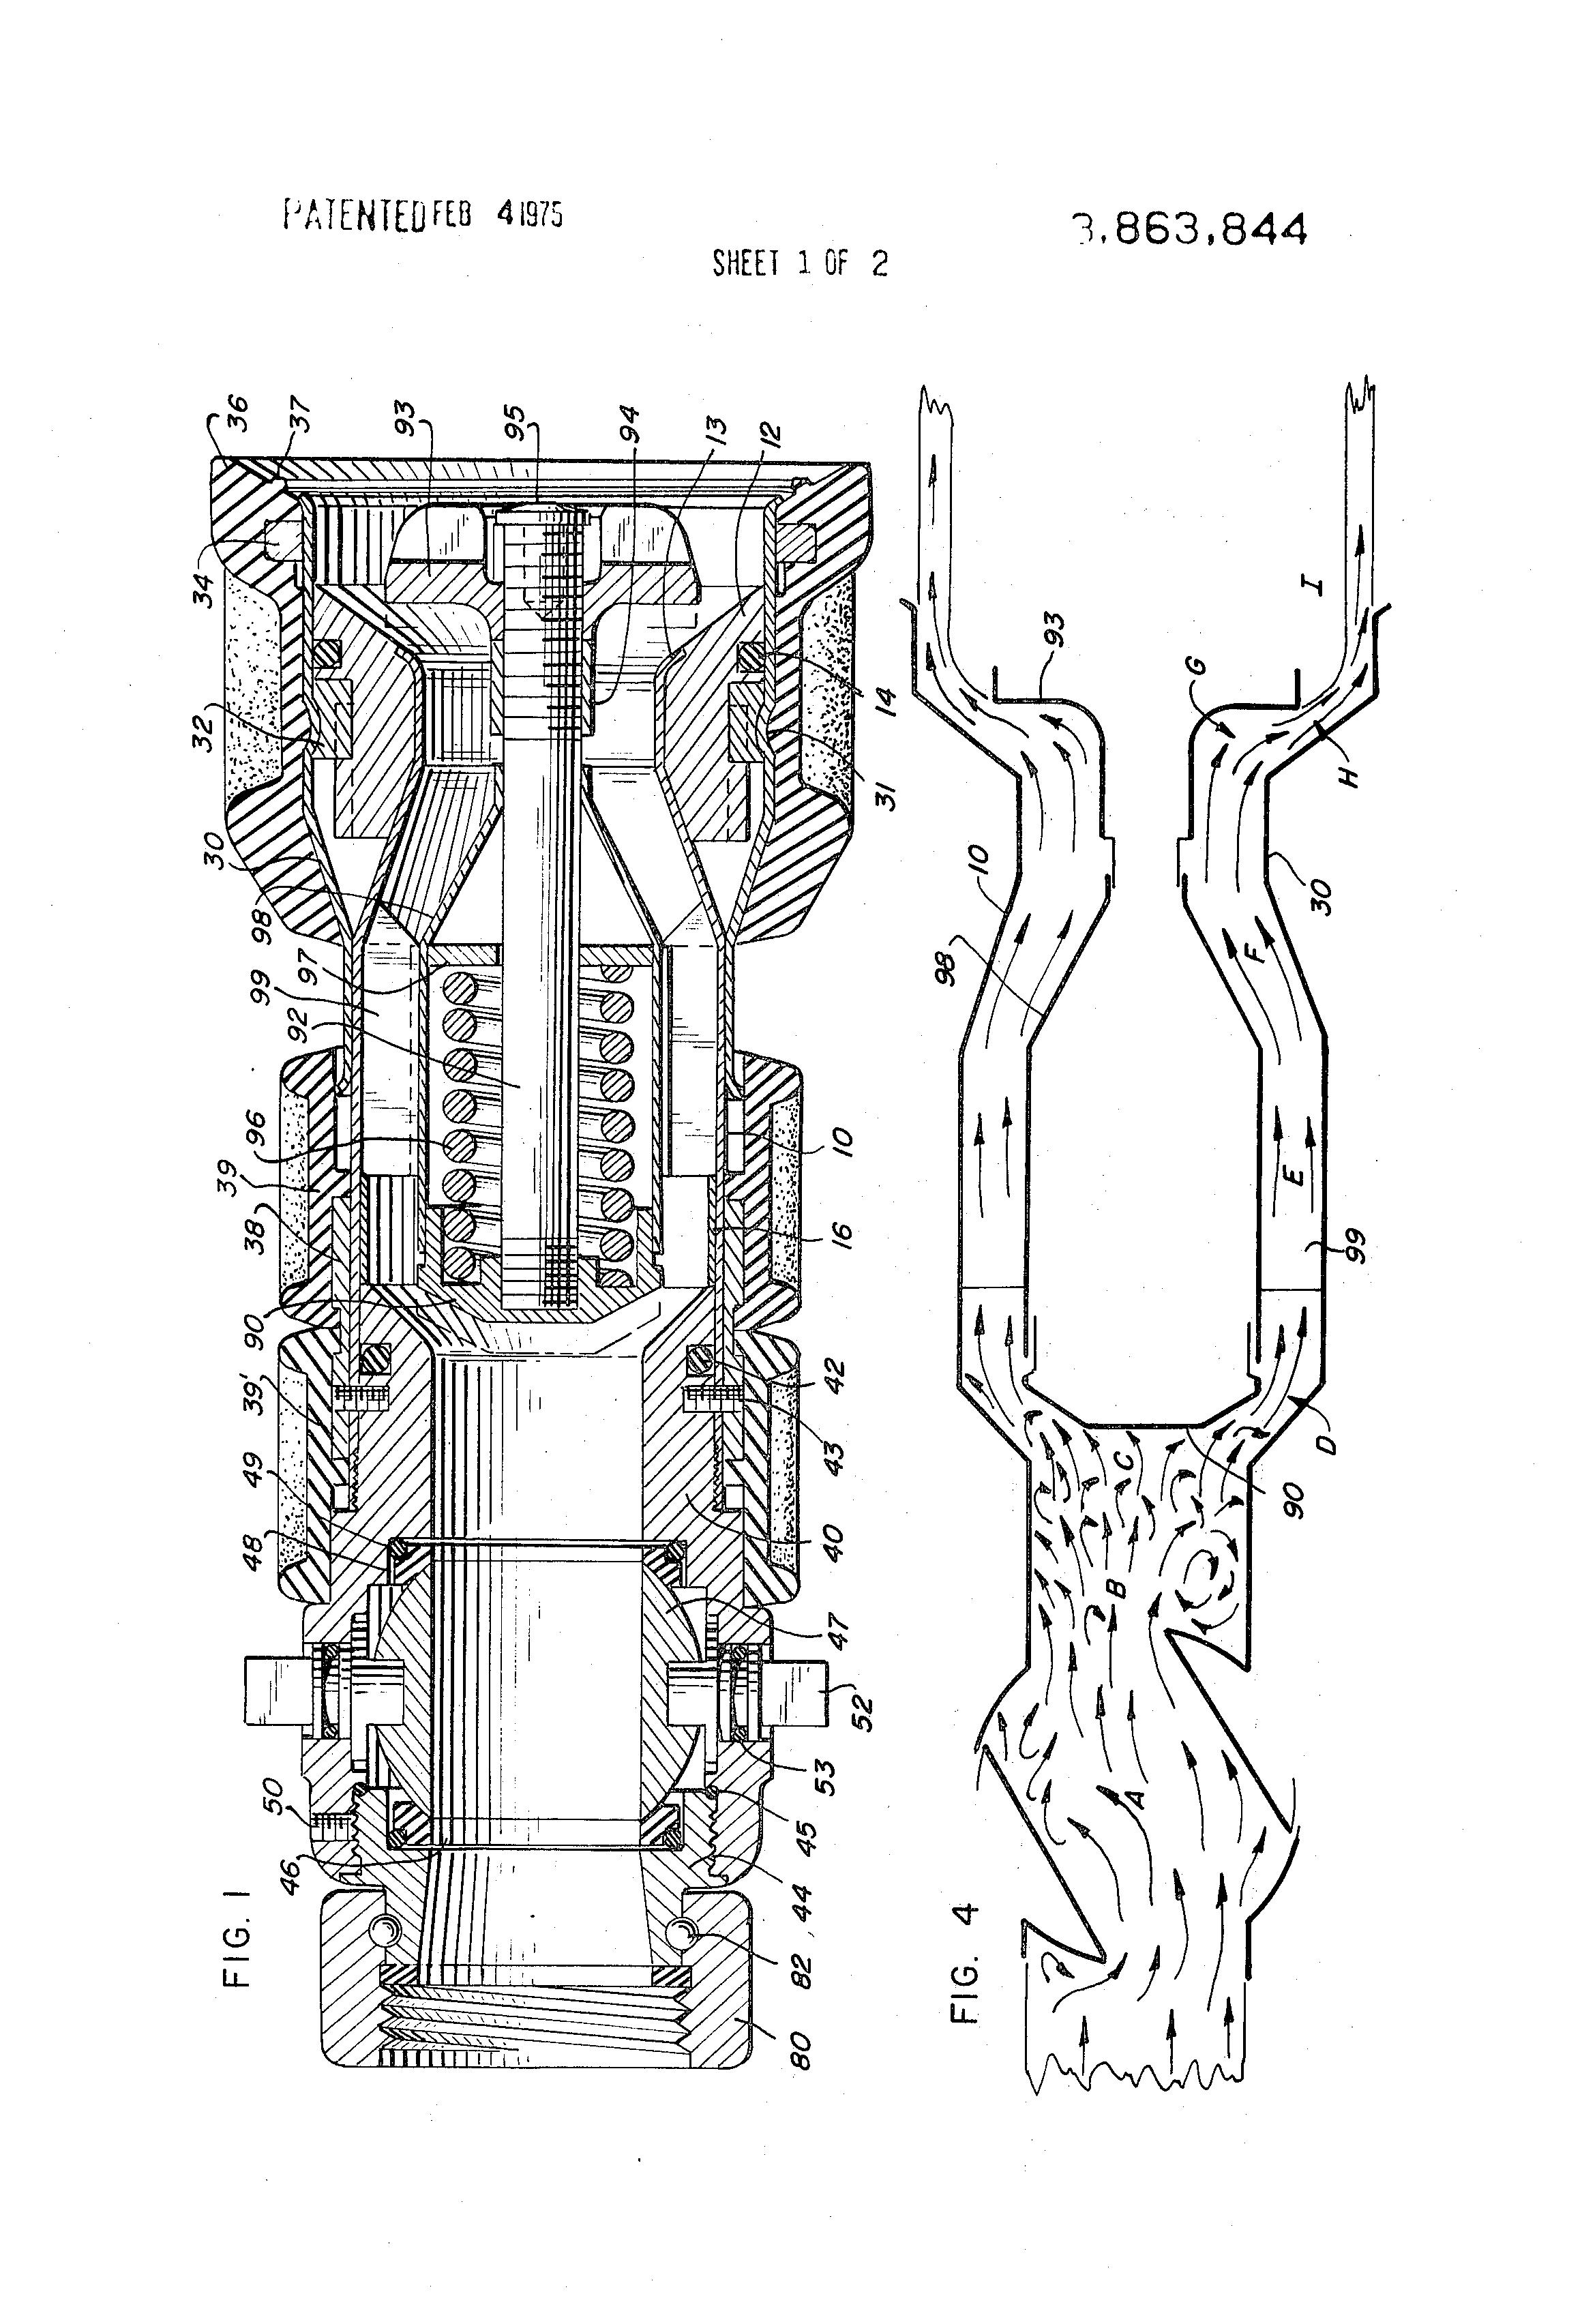 Garden Hose Parts Diagram